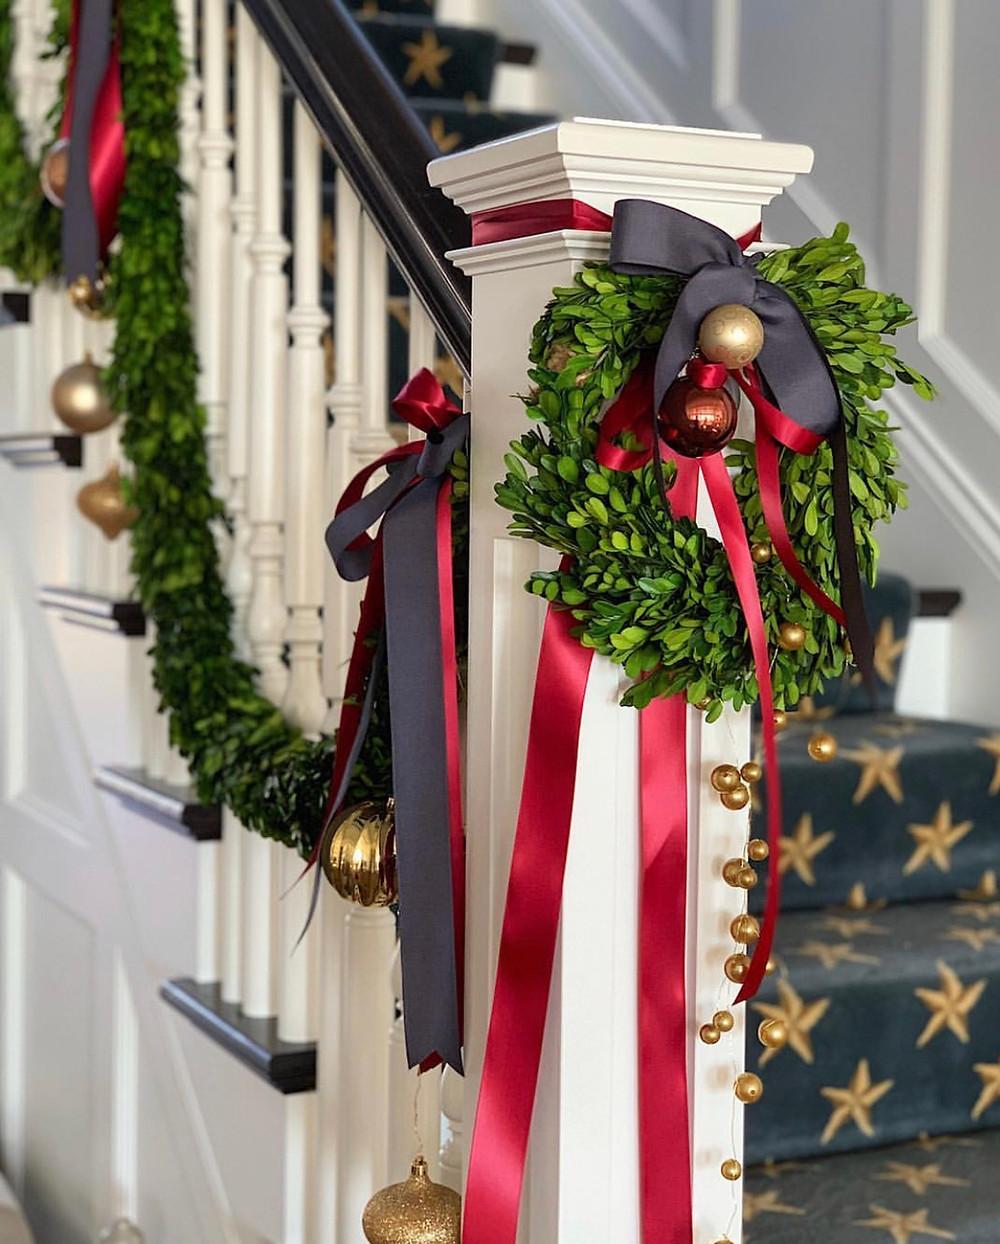 #tradtionalchristmasdecor #traditionalchristmas #timelessdesign #Designerlife #Designerliving #luxurydesign #christmas2018 #Christmasdecor